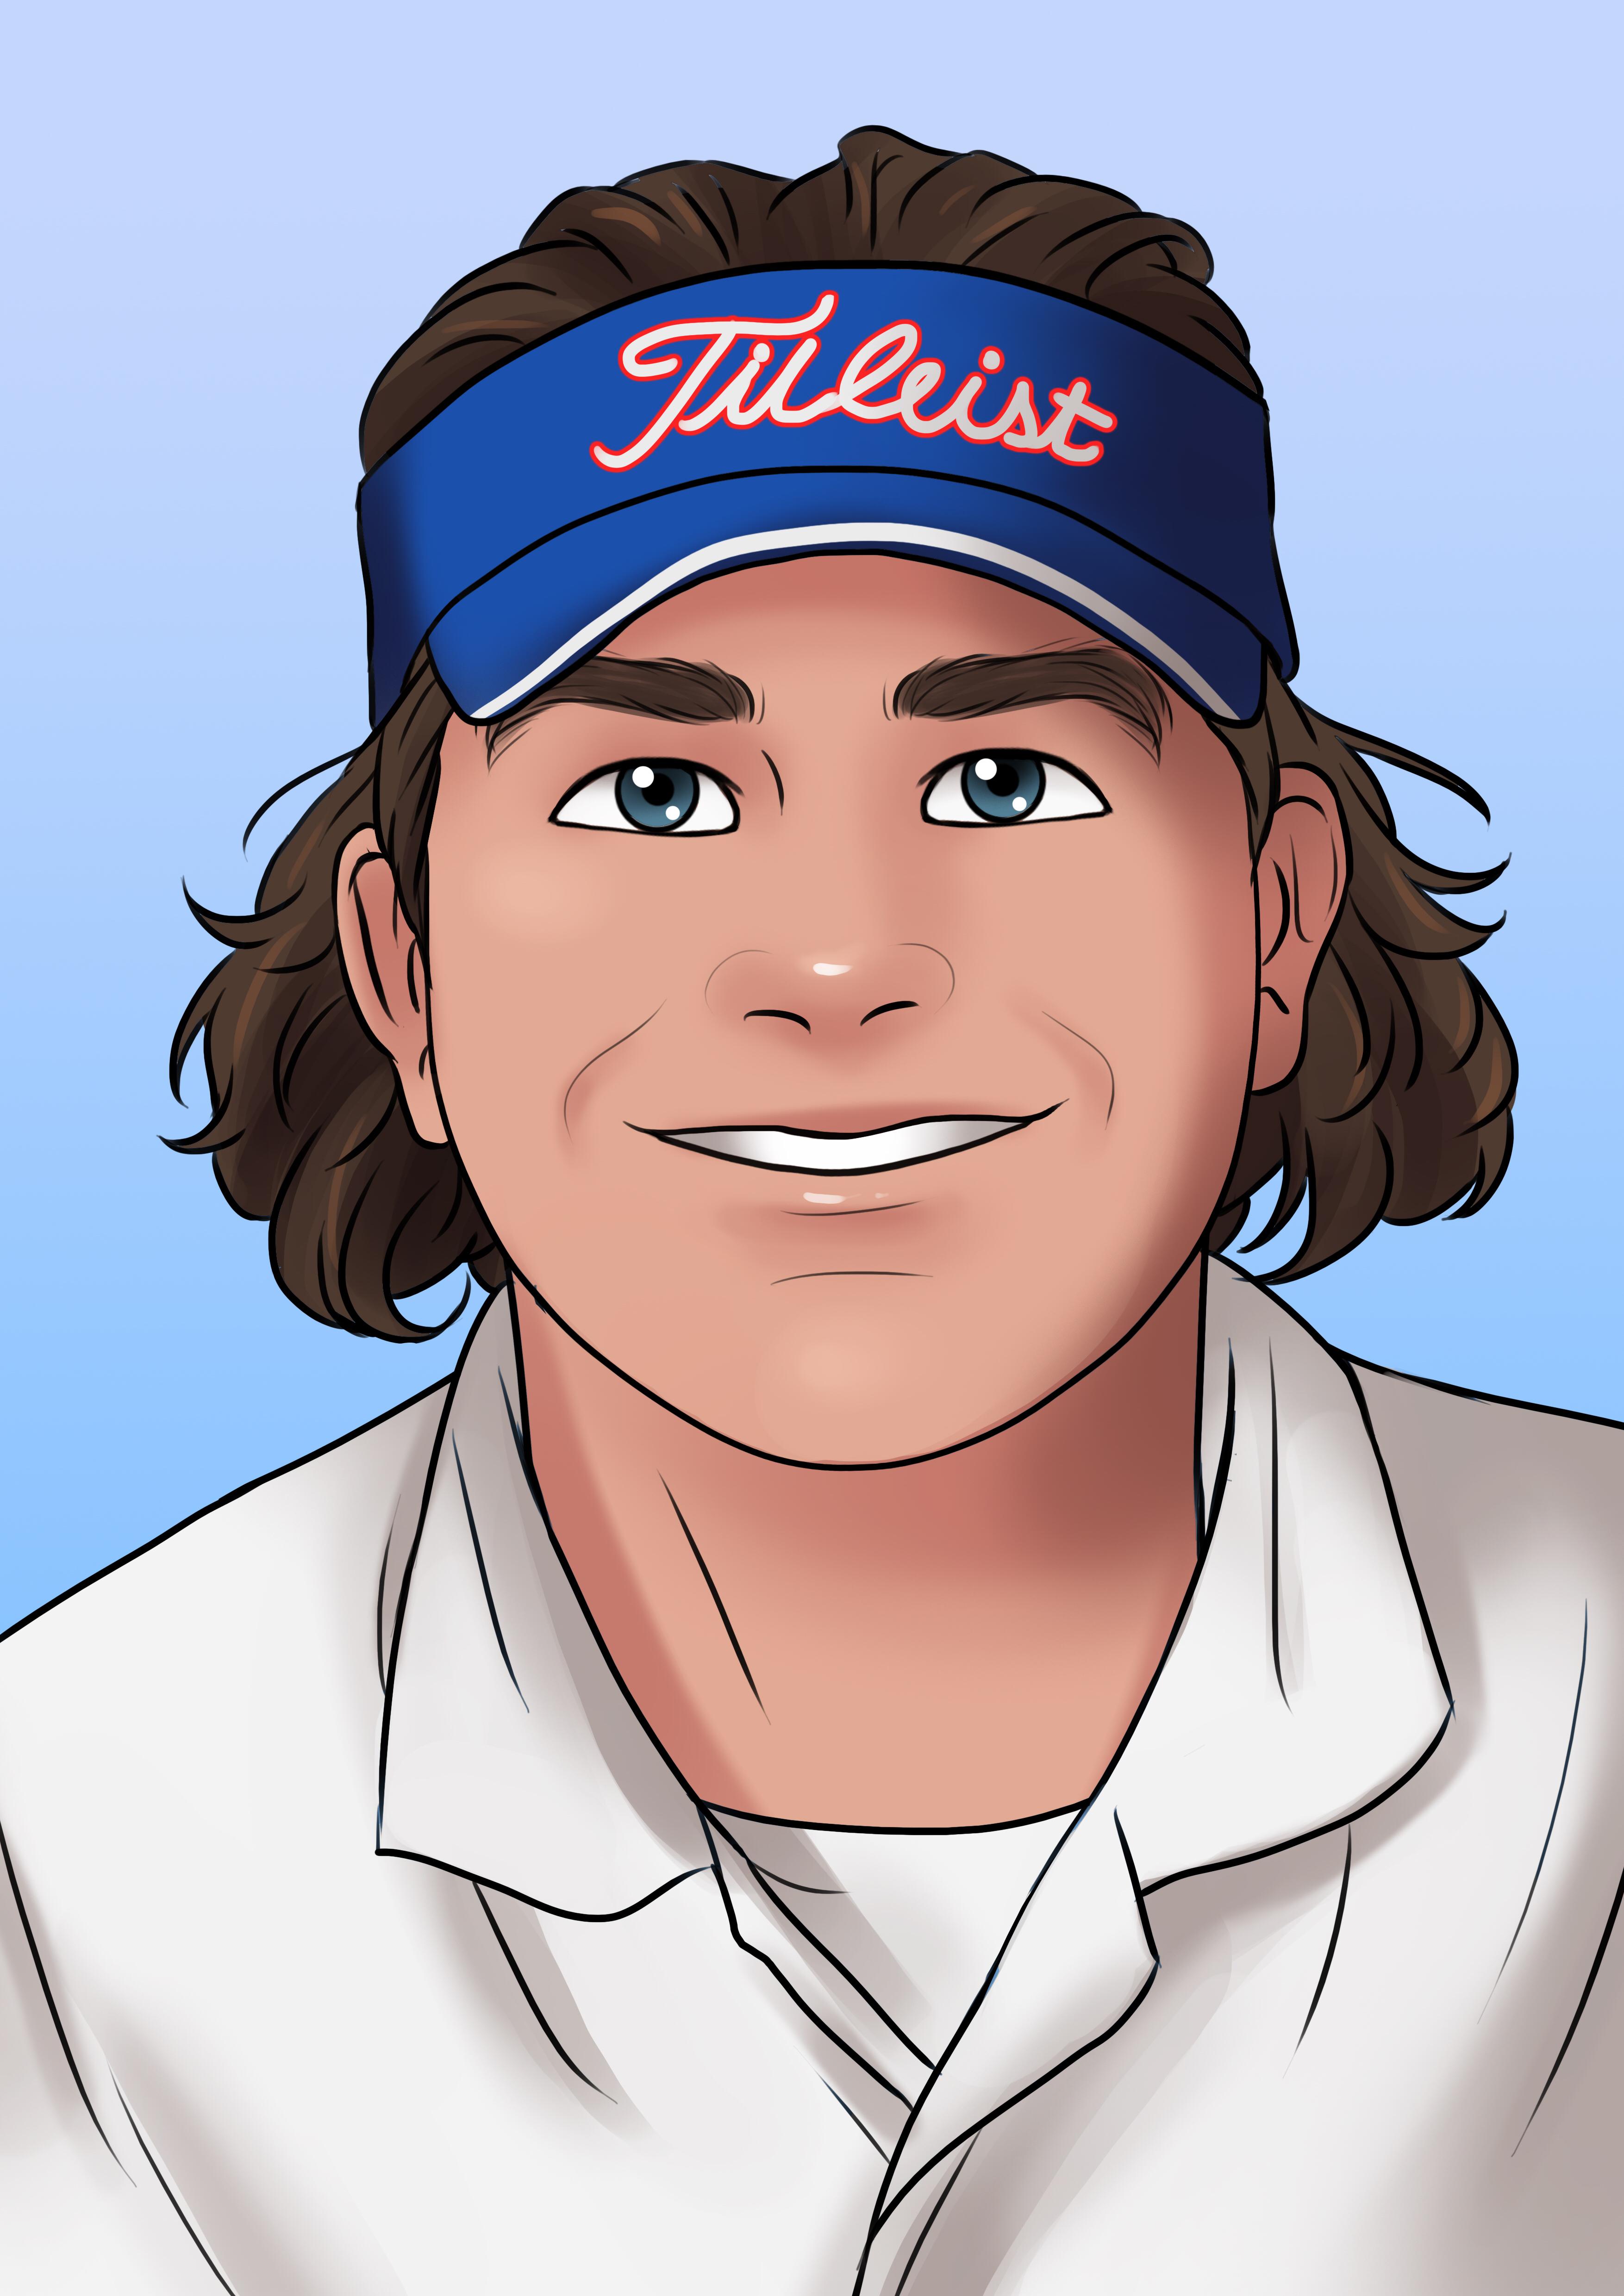 Avatar of golfer named Axel Roth